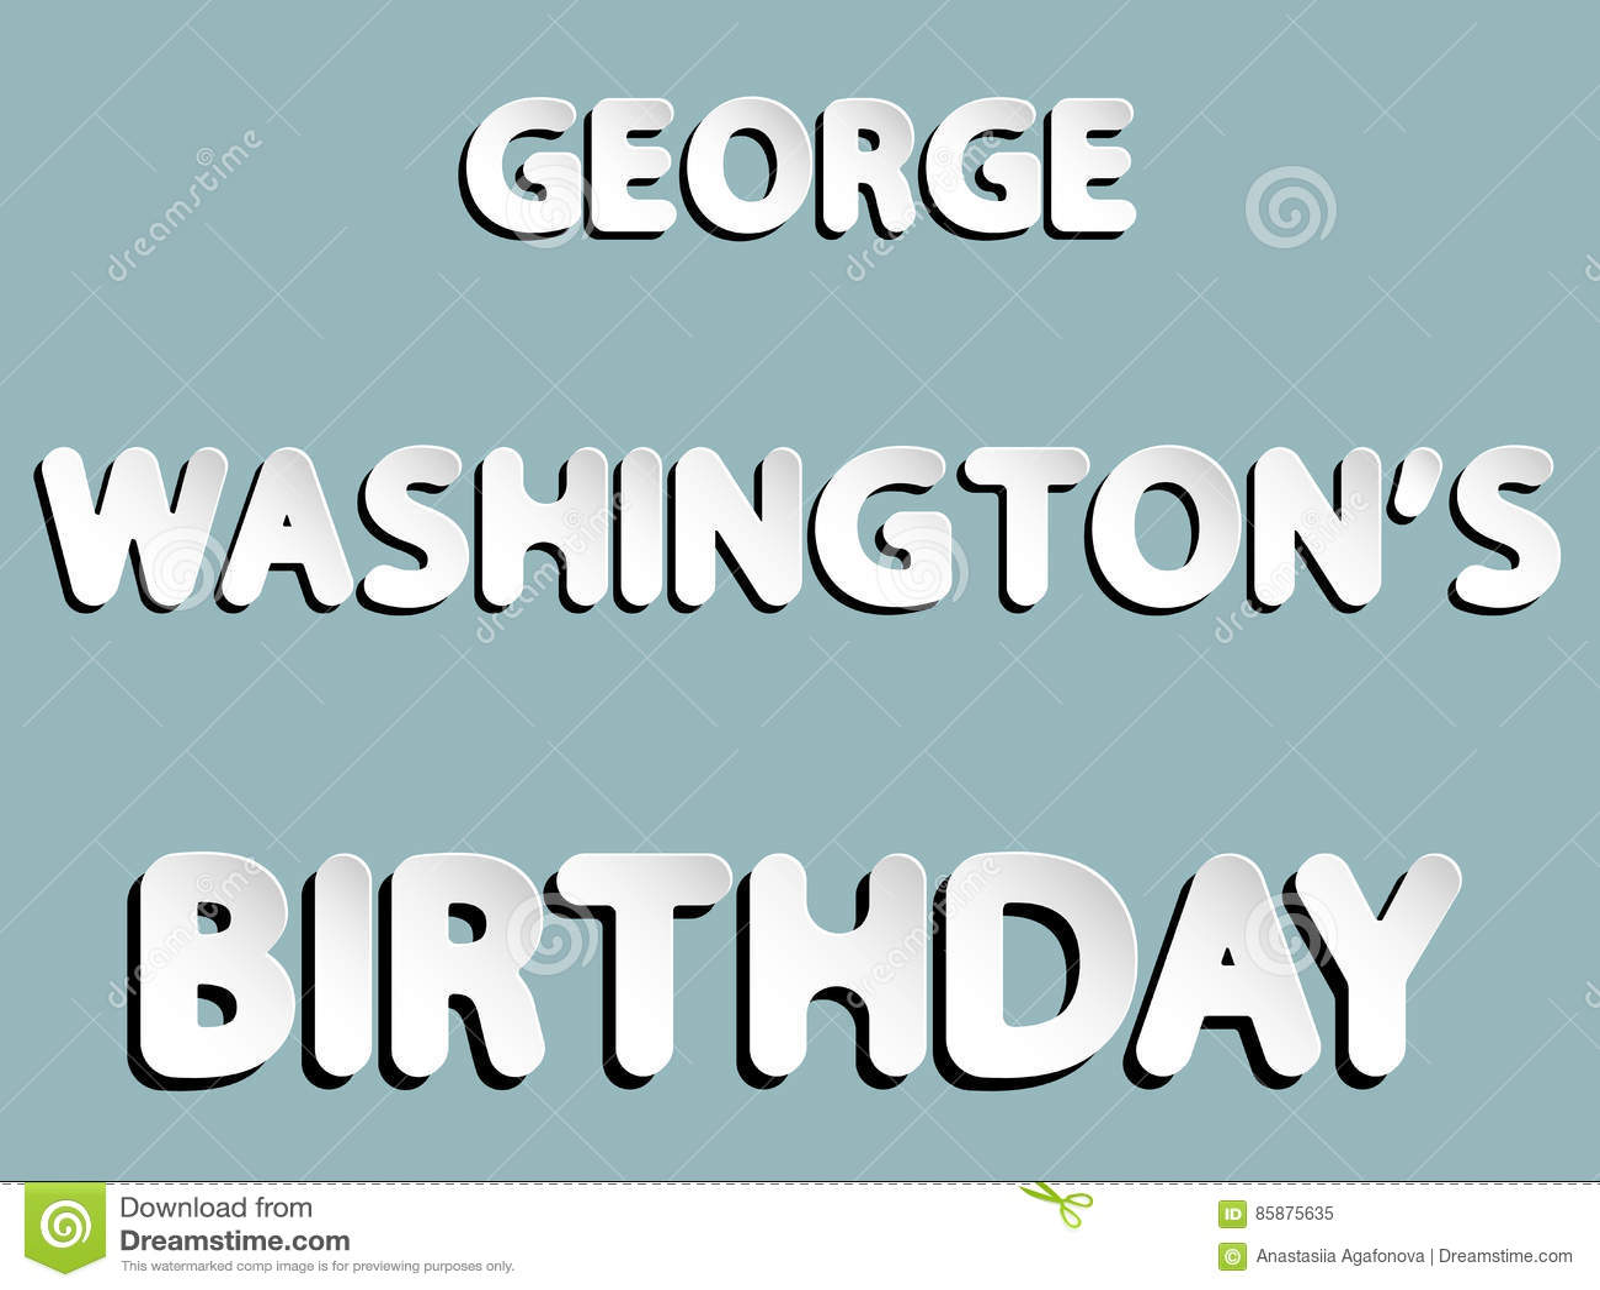 500 word essay on george washington Free essay: george washington carver george washington carver was born  during the civil war years on a missouri farm near diamond grove, newton.